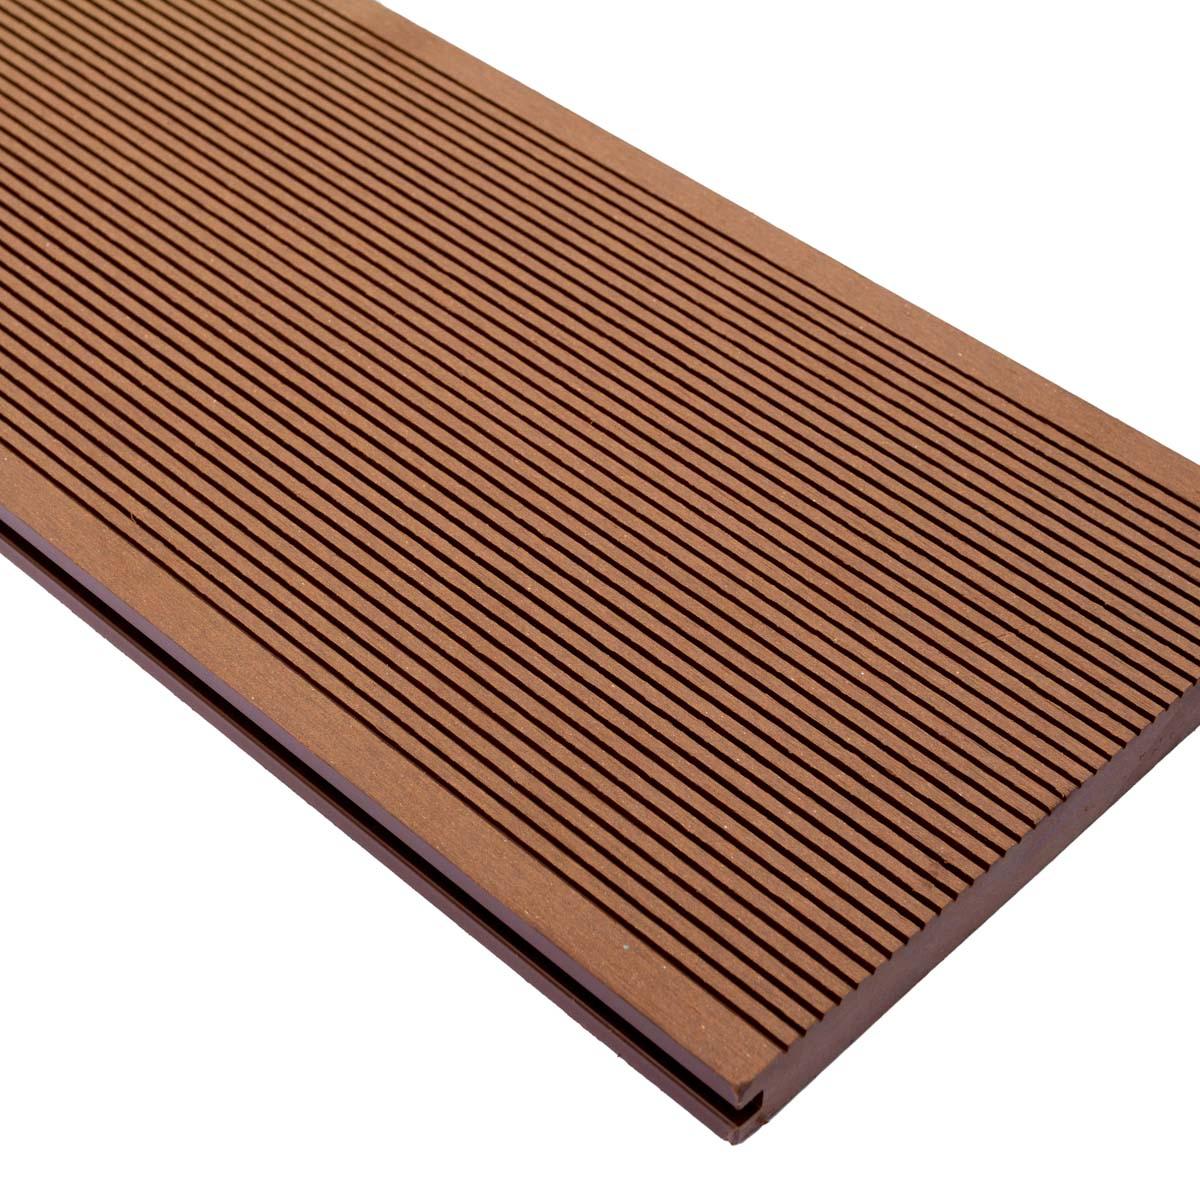 Terrassebord Kompositt Stavern brun